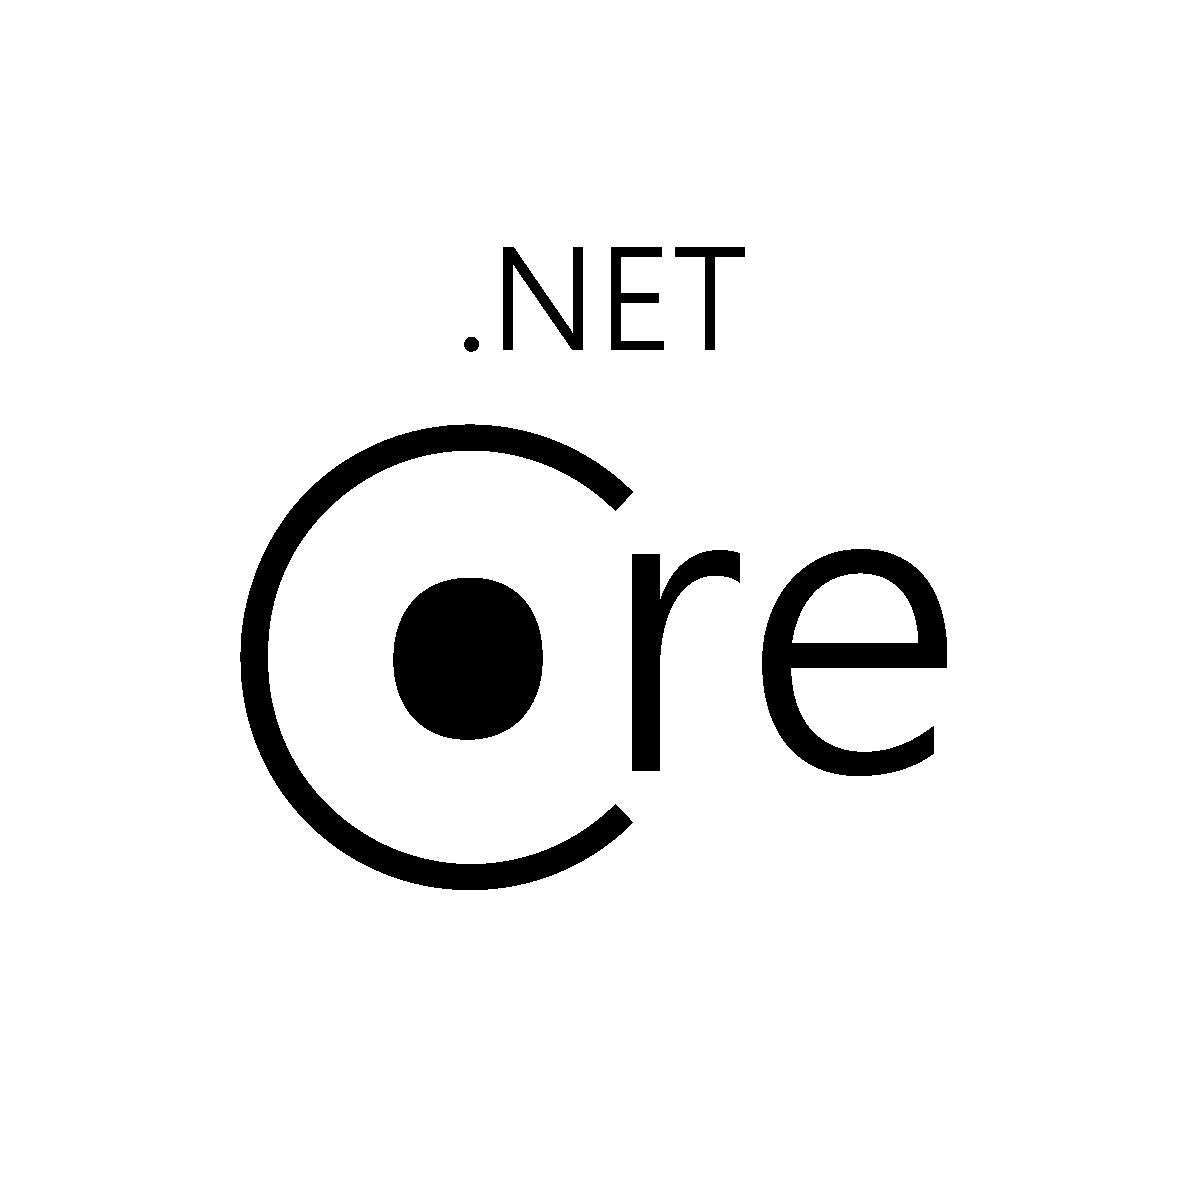 https://raw.githubusercontent.com/campusMVP/dotnetCoreLogoPack/master/.NET%20Core/Bitmap%20RGB/Bitmap-BIG_NET-Core-Logo_Black_Square_RGB.png